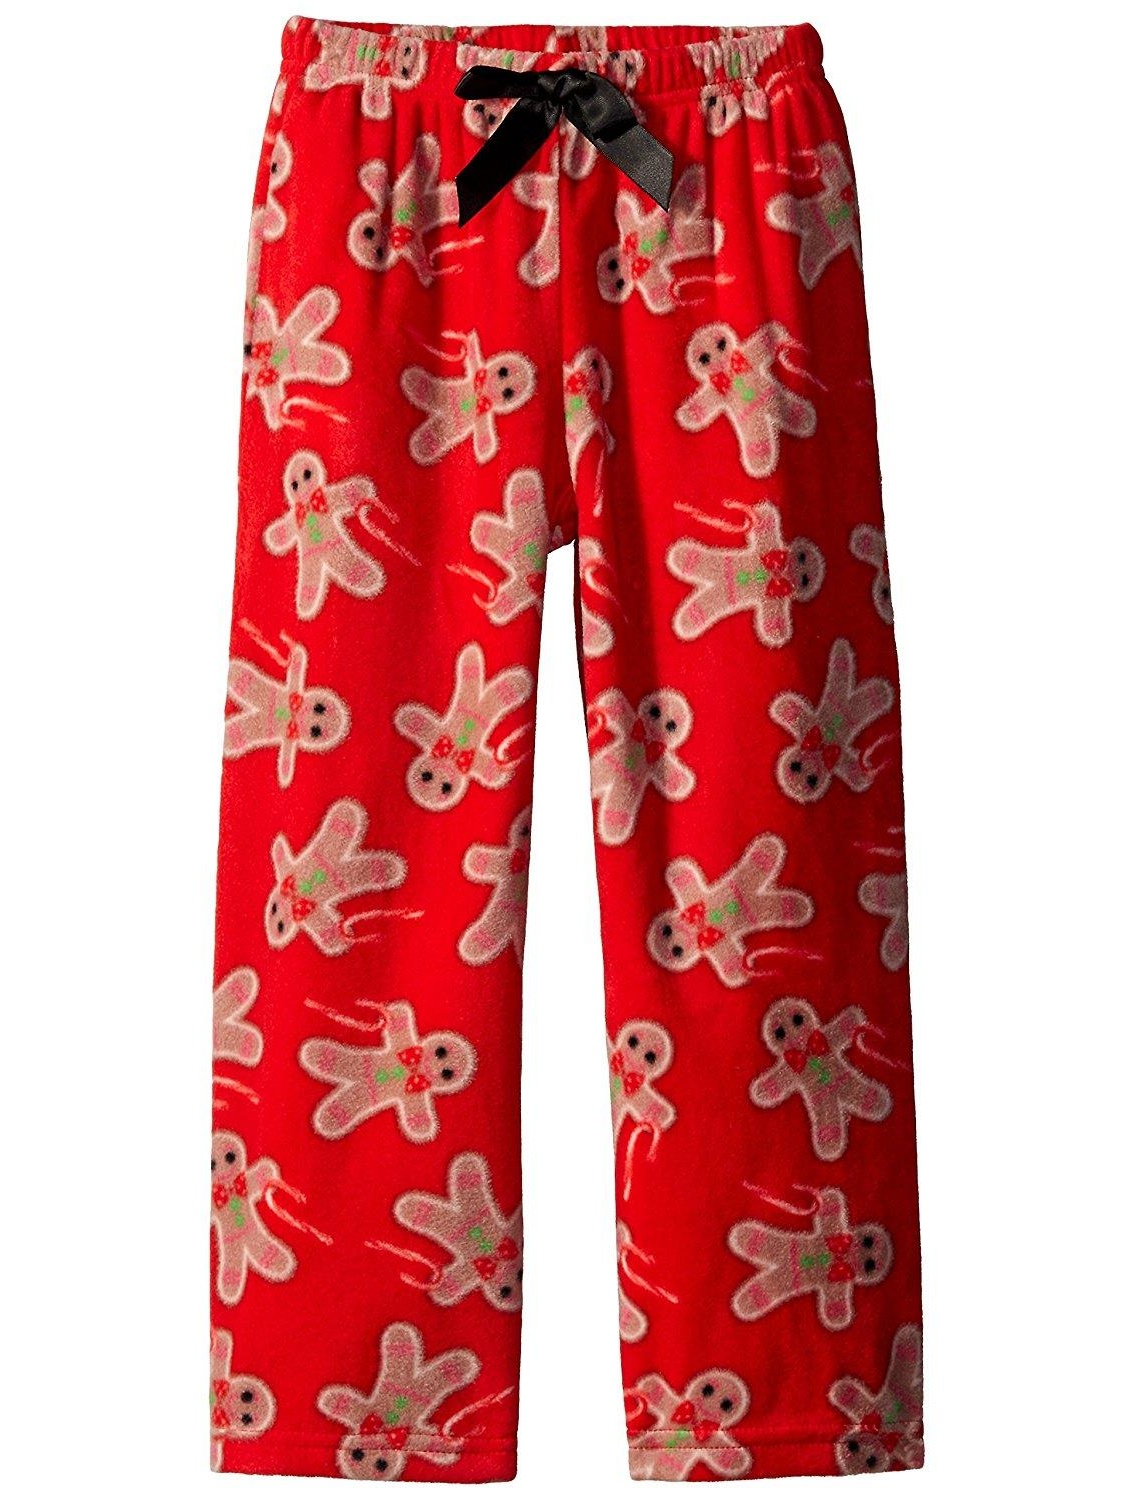 Girl Thing Girls Green Fleece Candy Cane Sleep Pants Pajama Bottoms